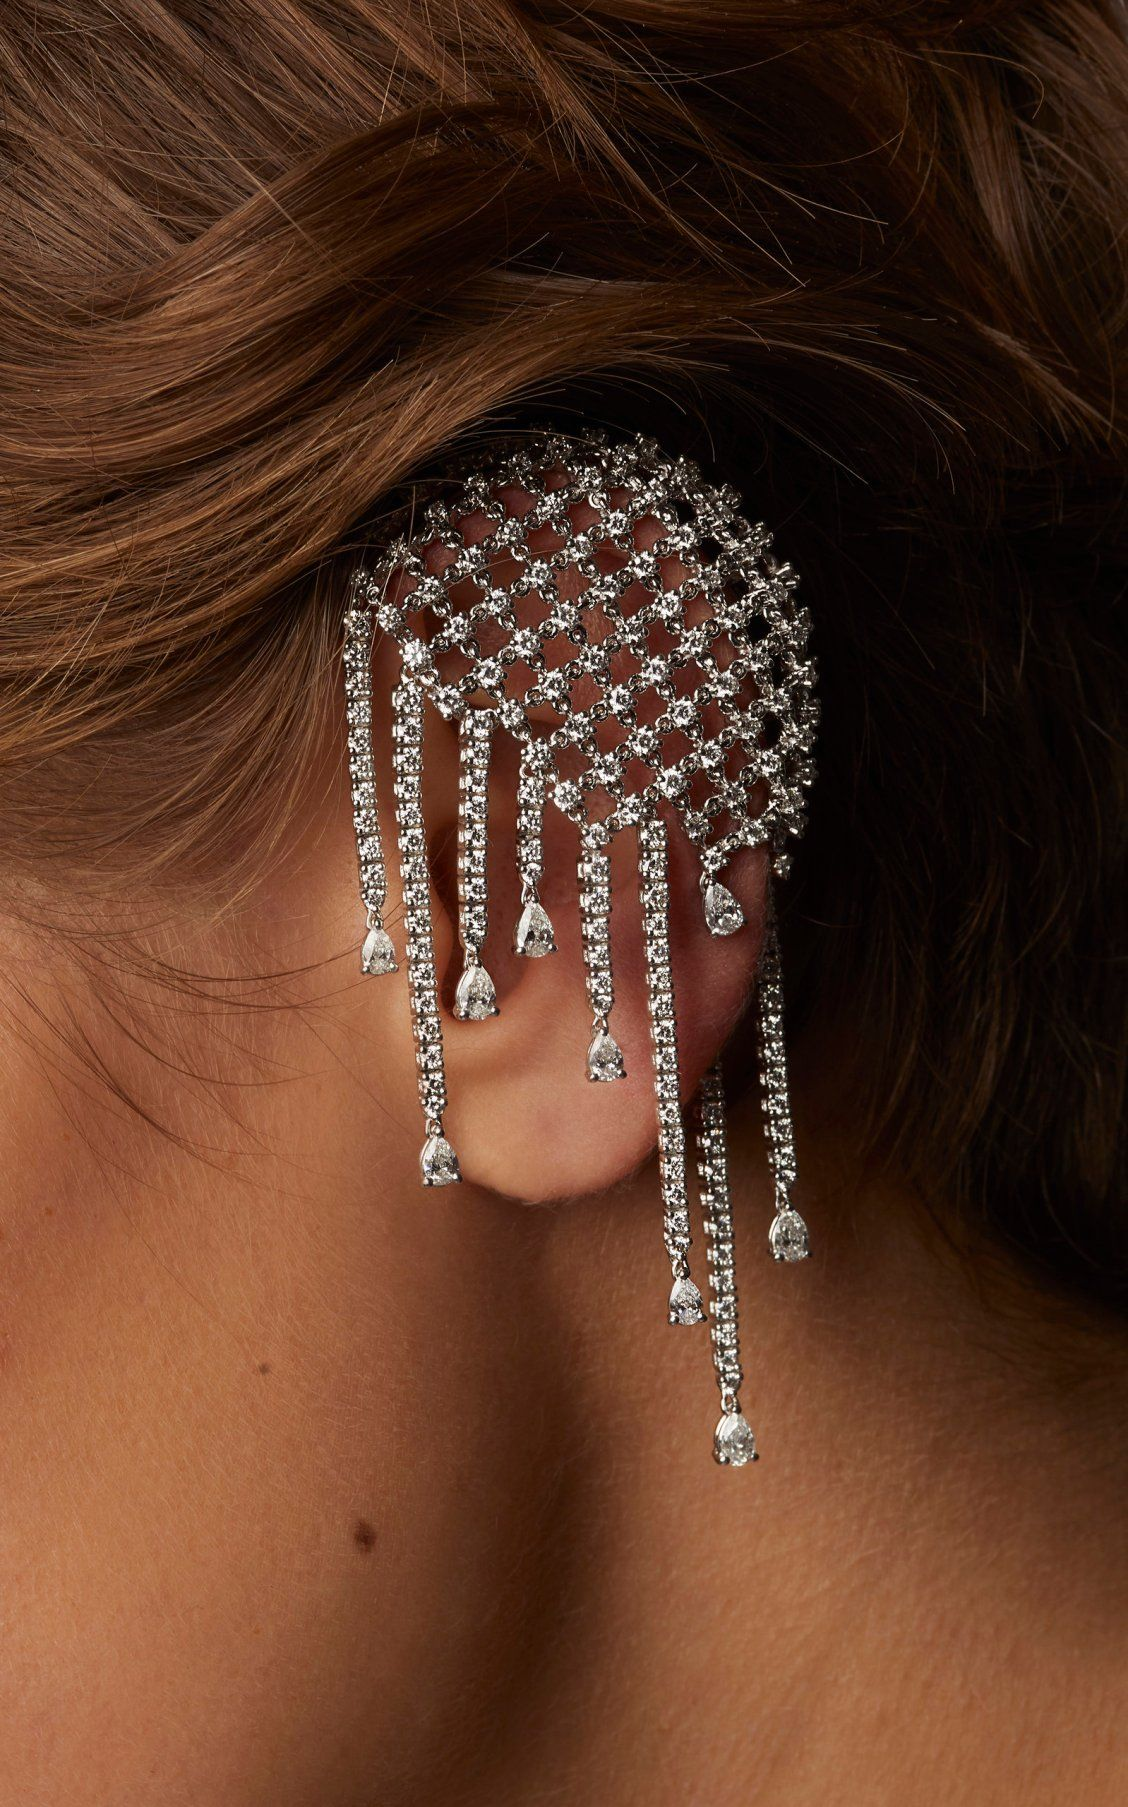 581da2905 18K White Gold Mismatch Diamond Cage Earring by Yeprem SS19 ...